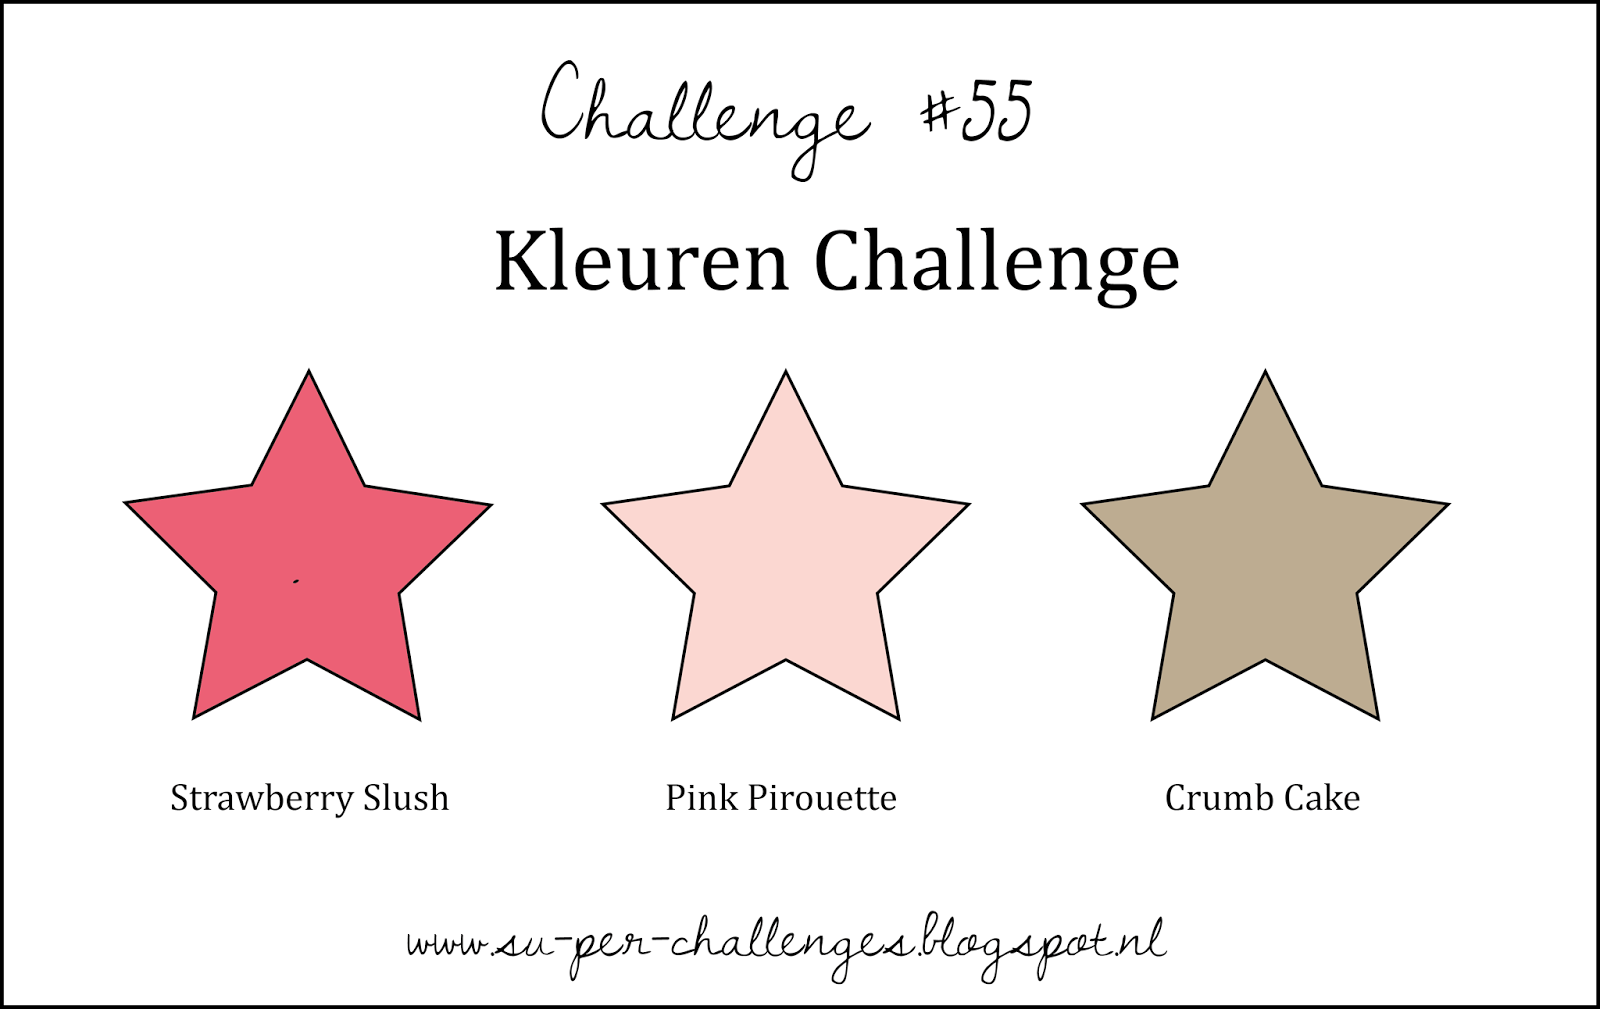 http://su-per-challenges.blogspot.nl/2014/09/challenge-55-kleuren-challenge.html